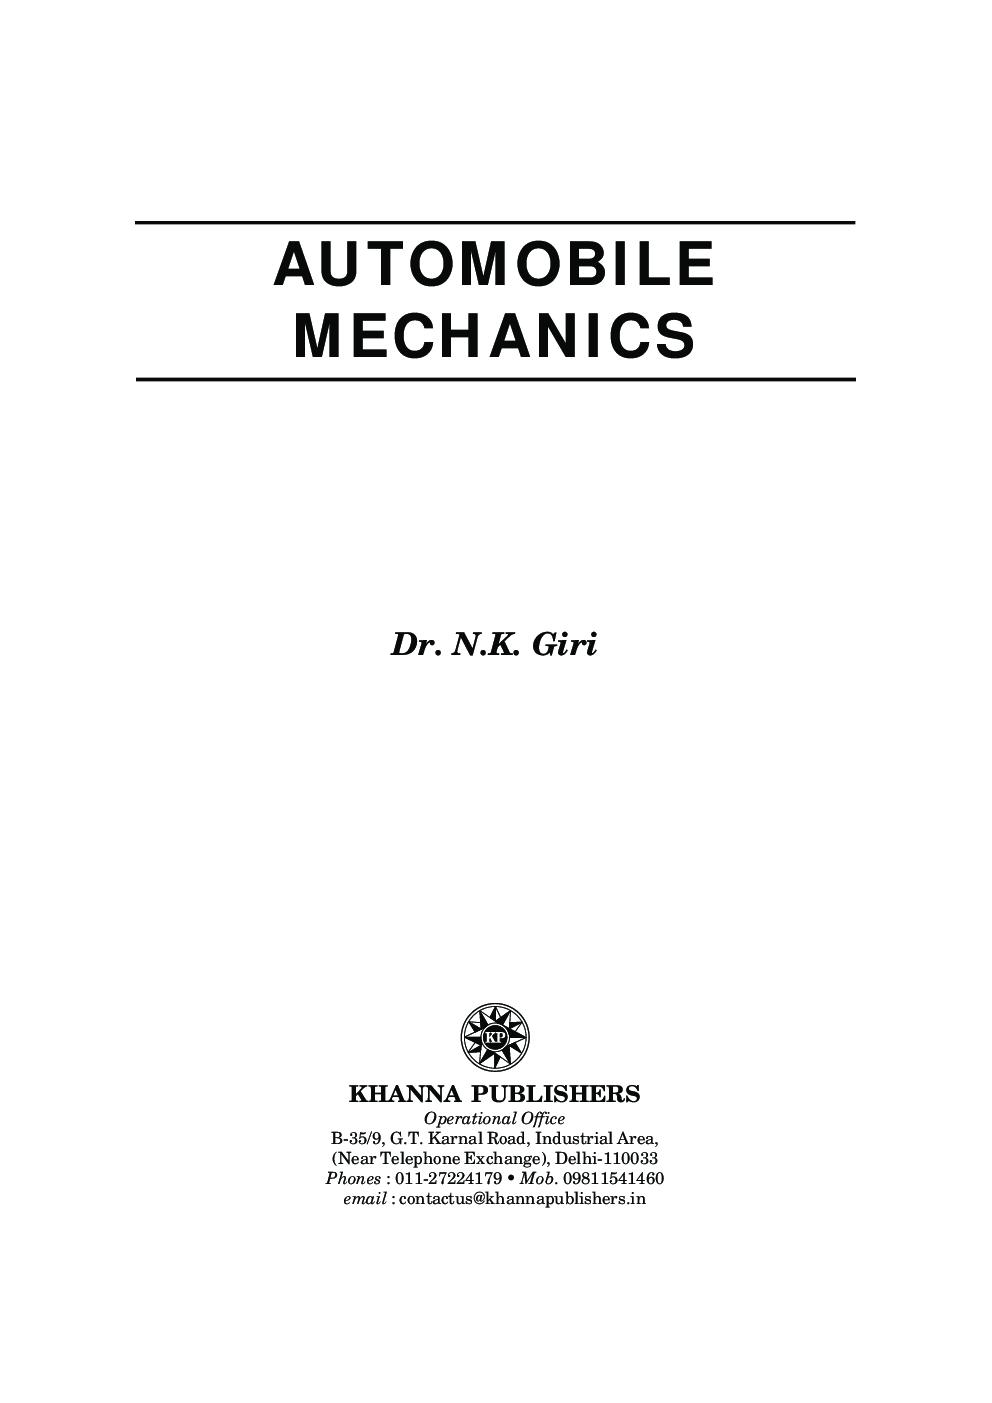 Automobile Mechanics - Page 2